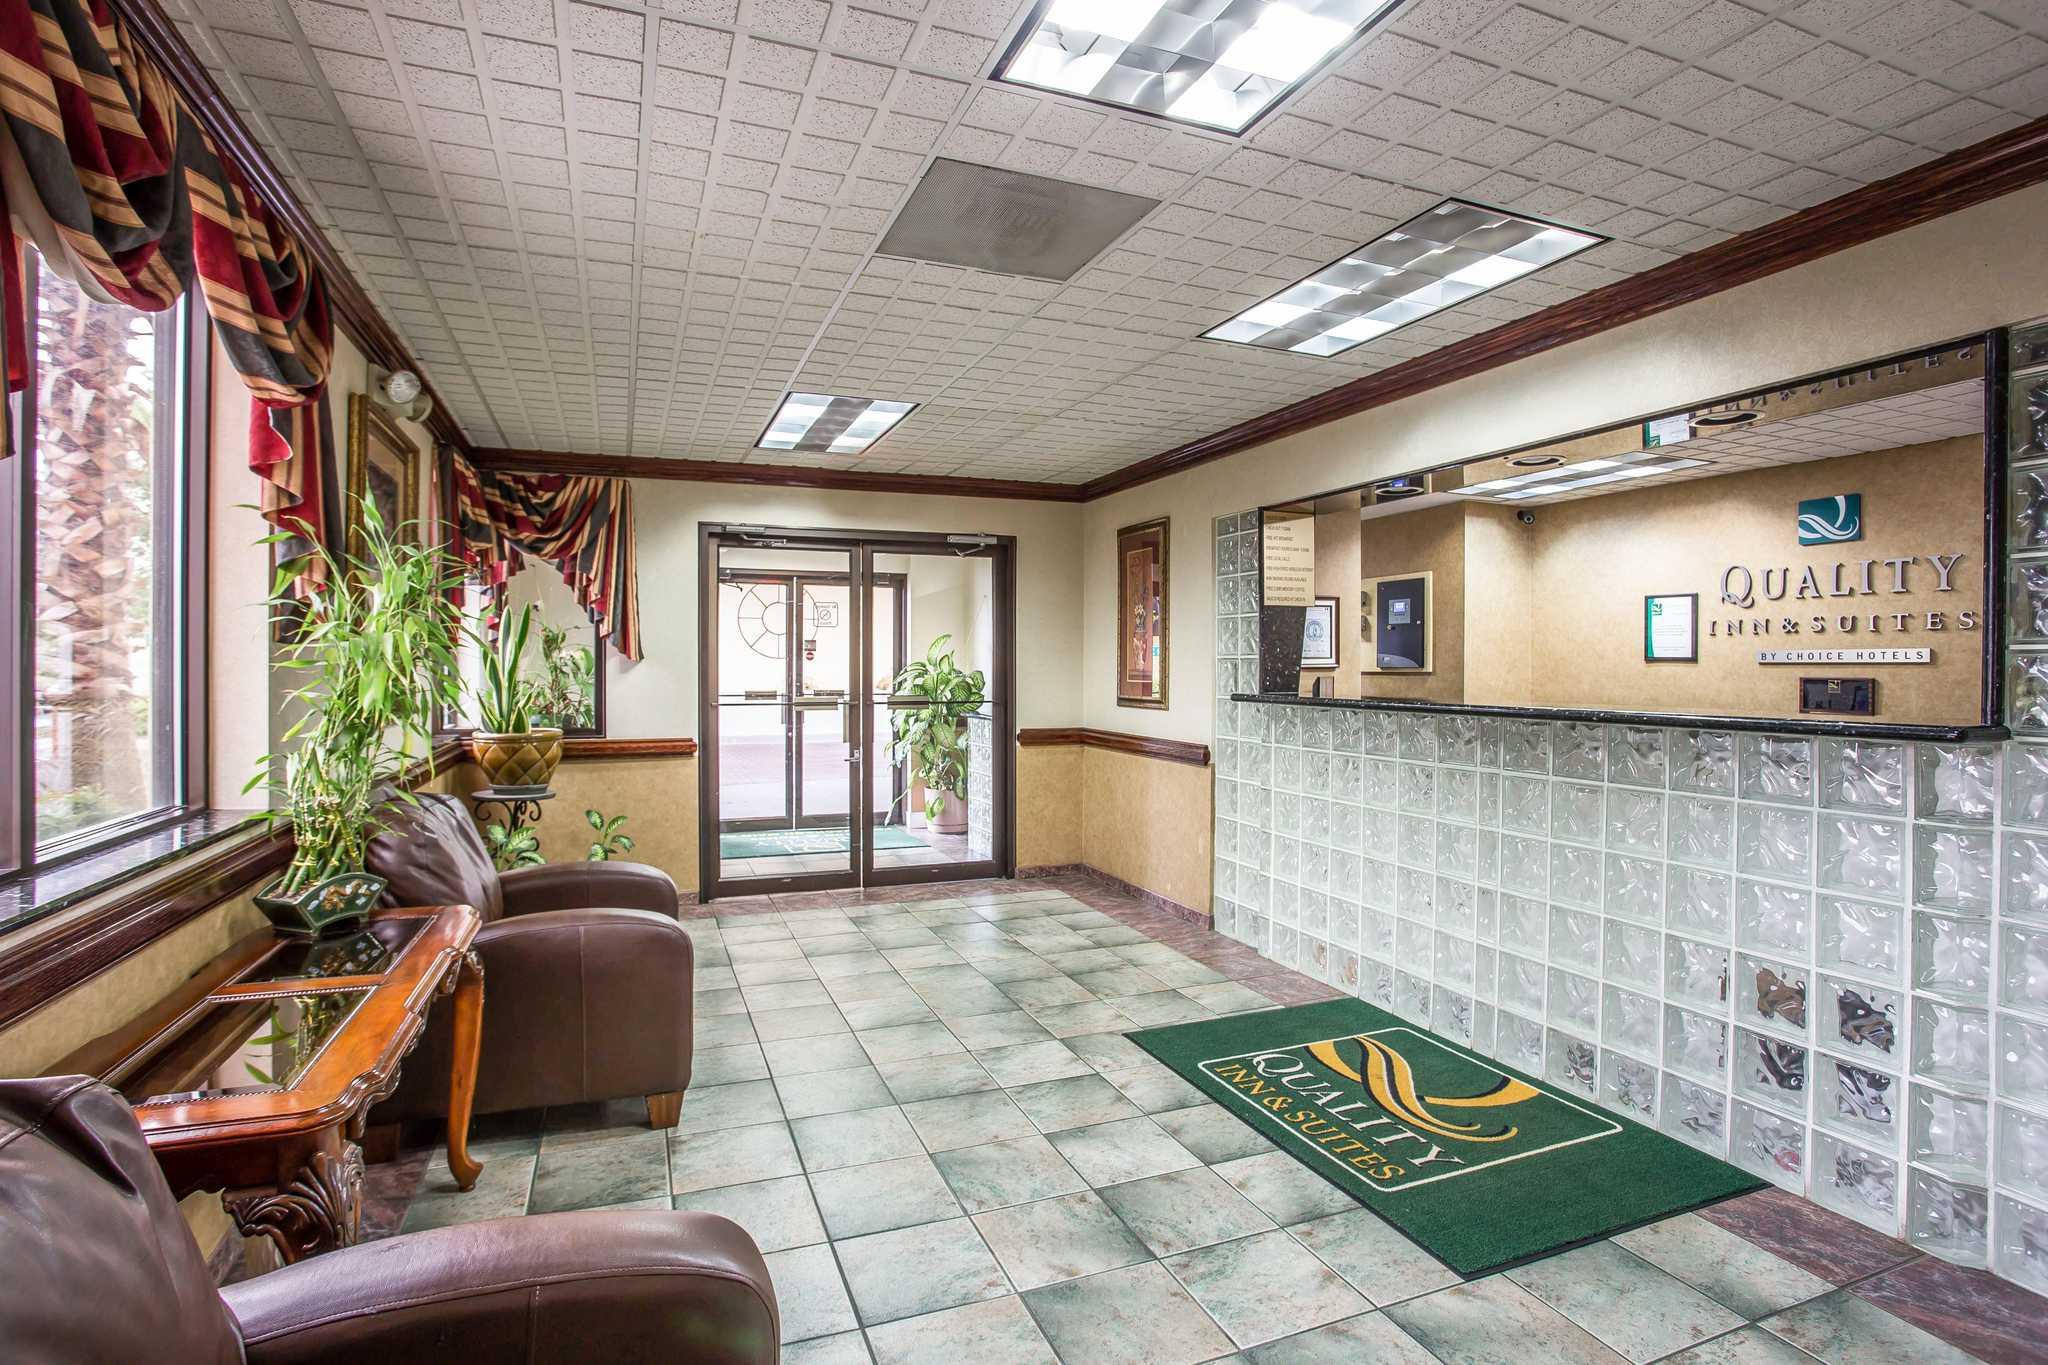 Quality Inn & Suites Ft. Jackson Maingate image 21